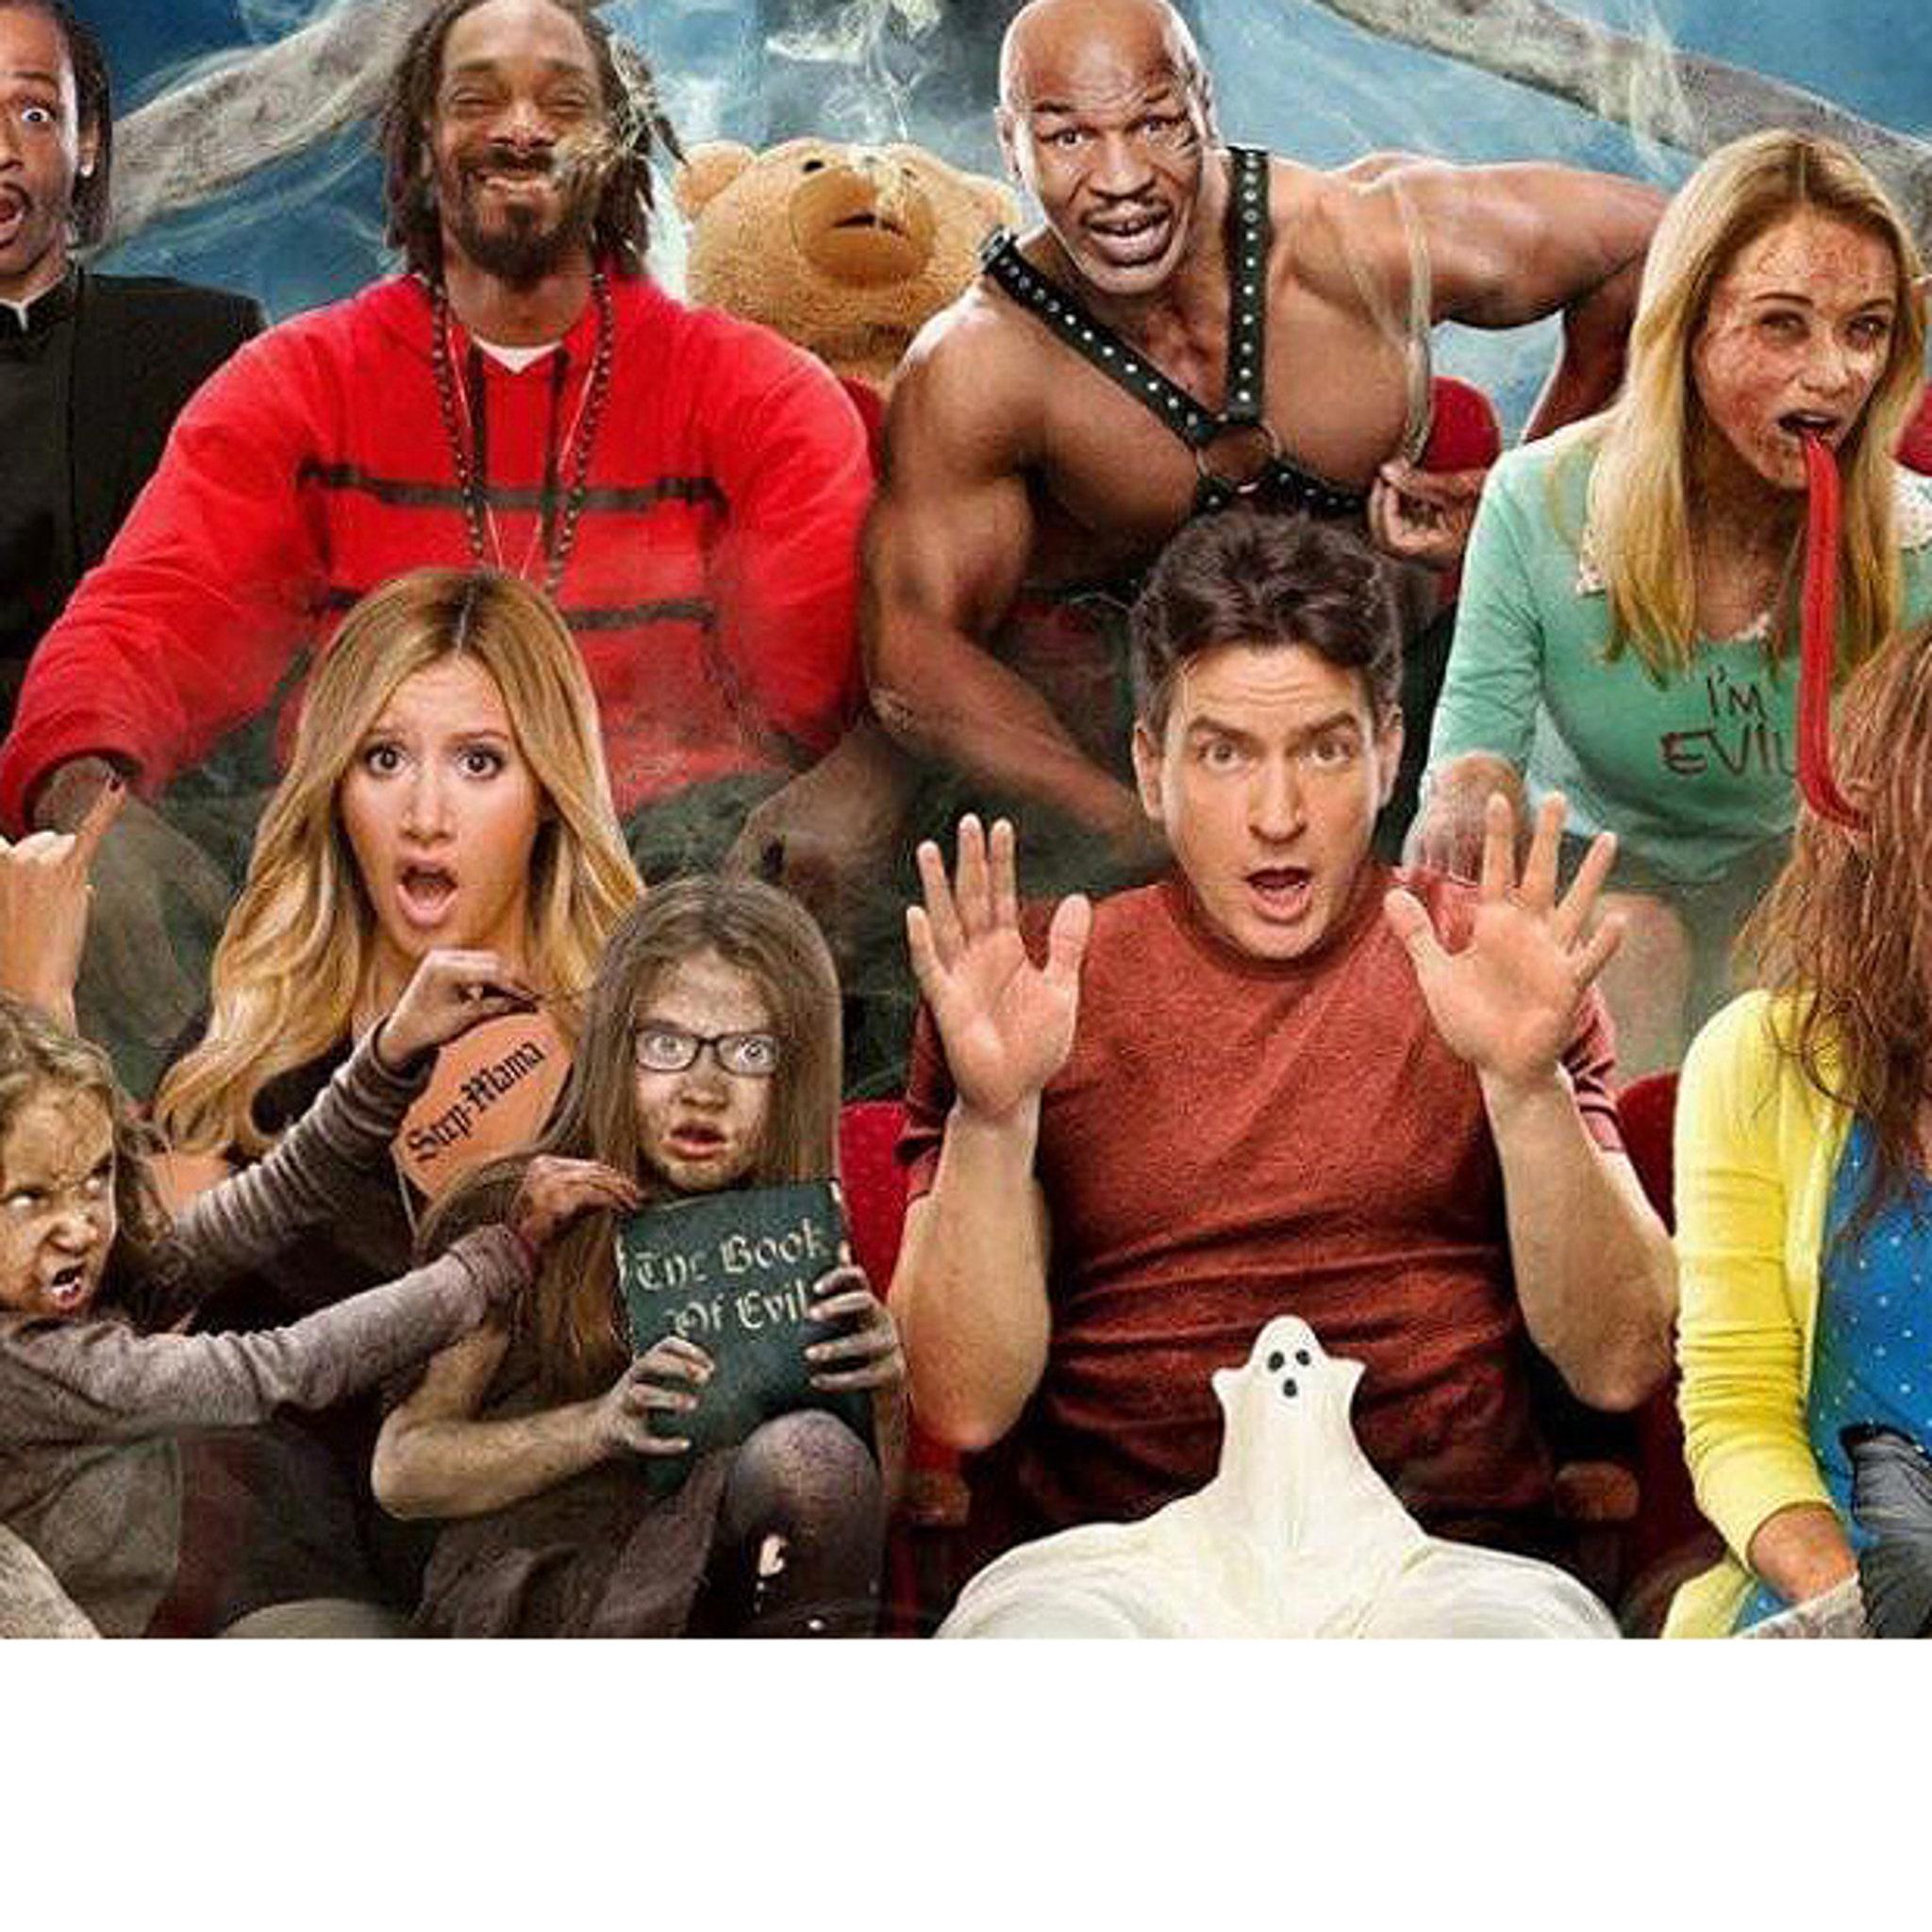 New Scary Movie 5 Trailer Lindsay Lohan And Honey Boo Boo